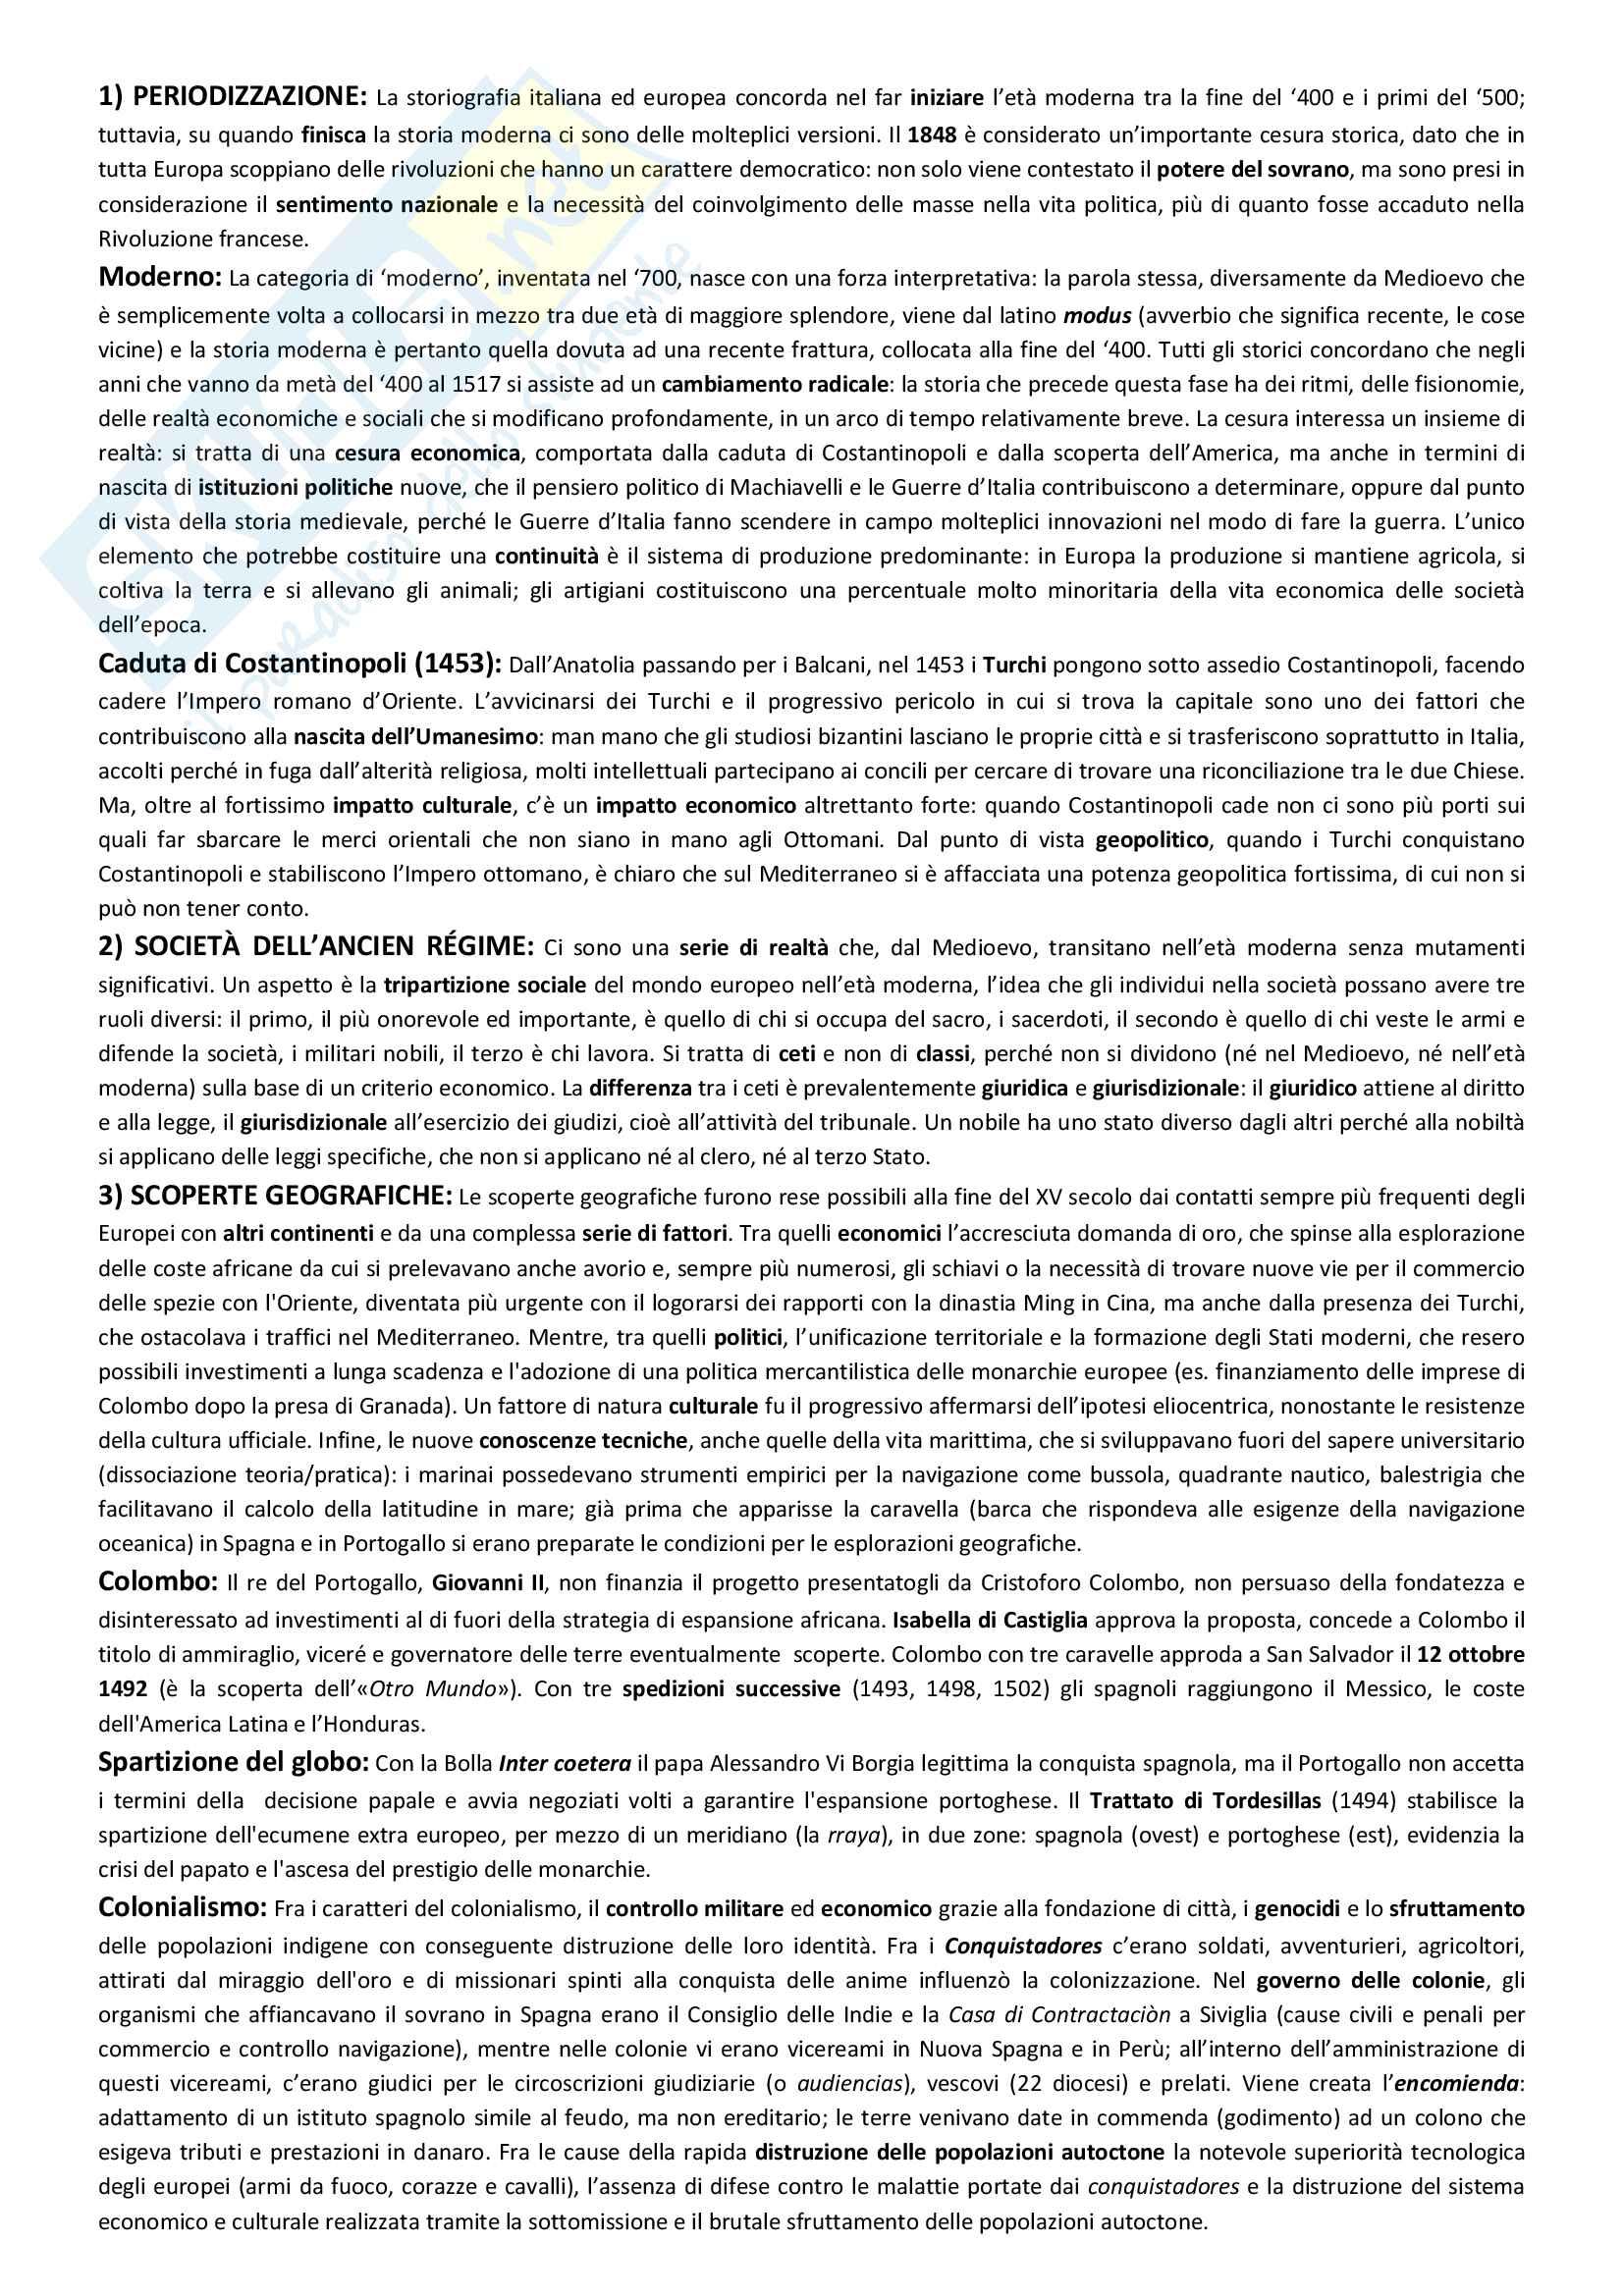 Storia moderna, Appunti - Regina Lupi